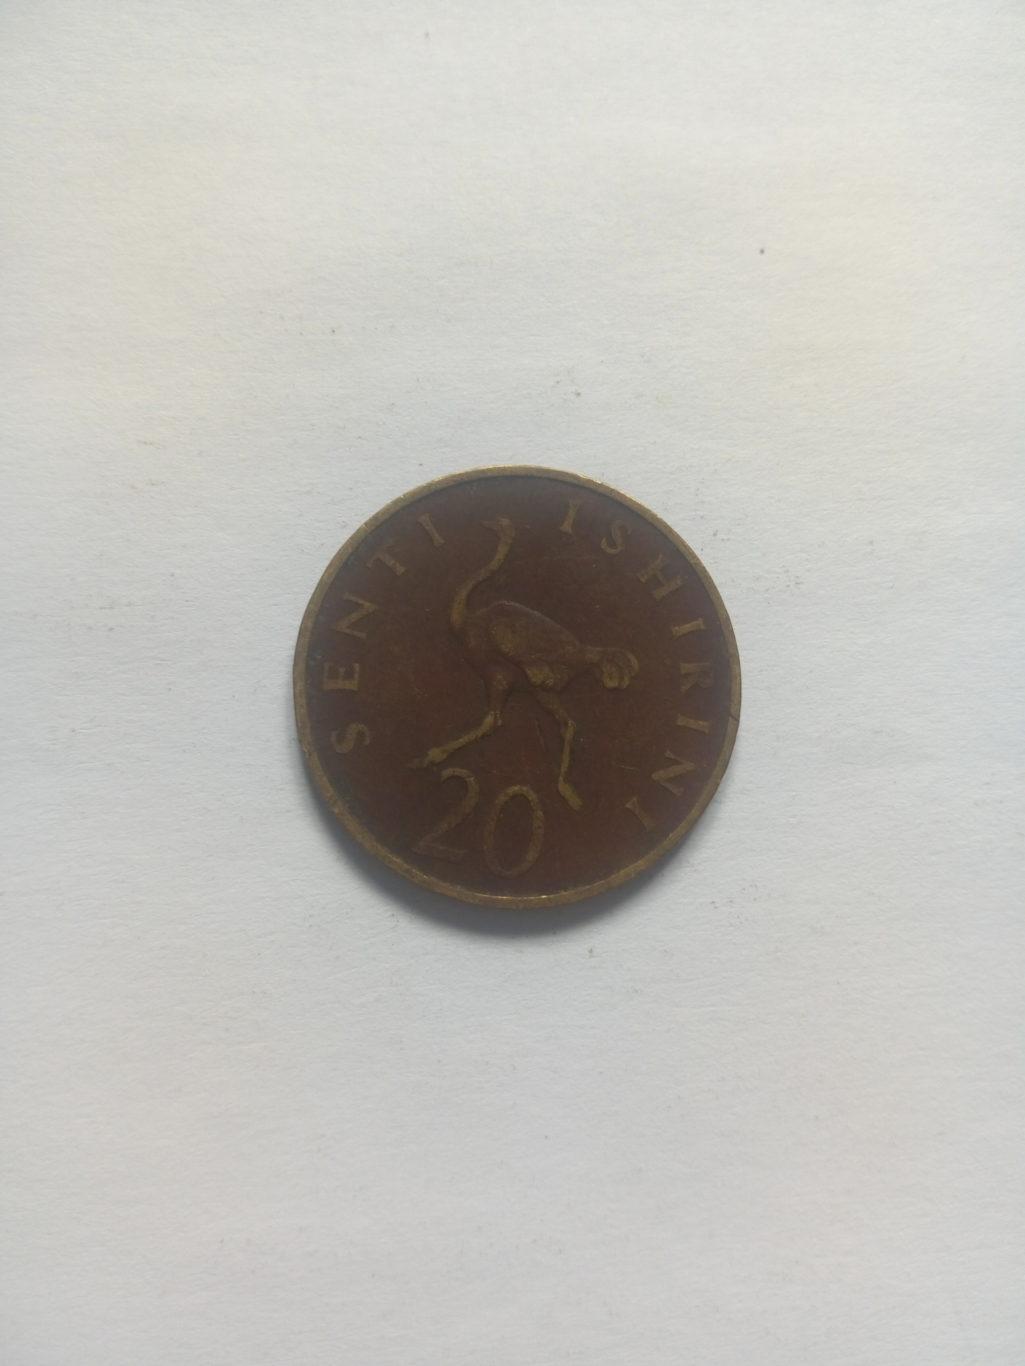 1966_senti 20 ya tanzania